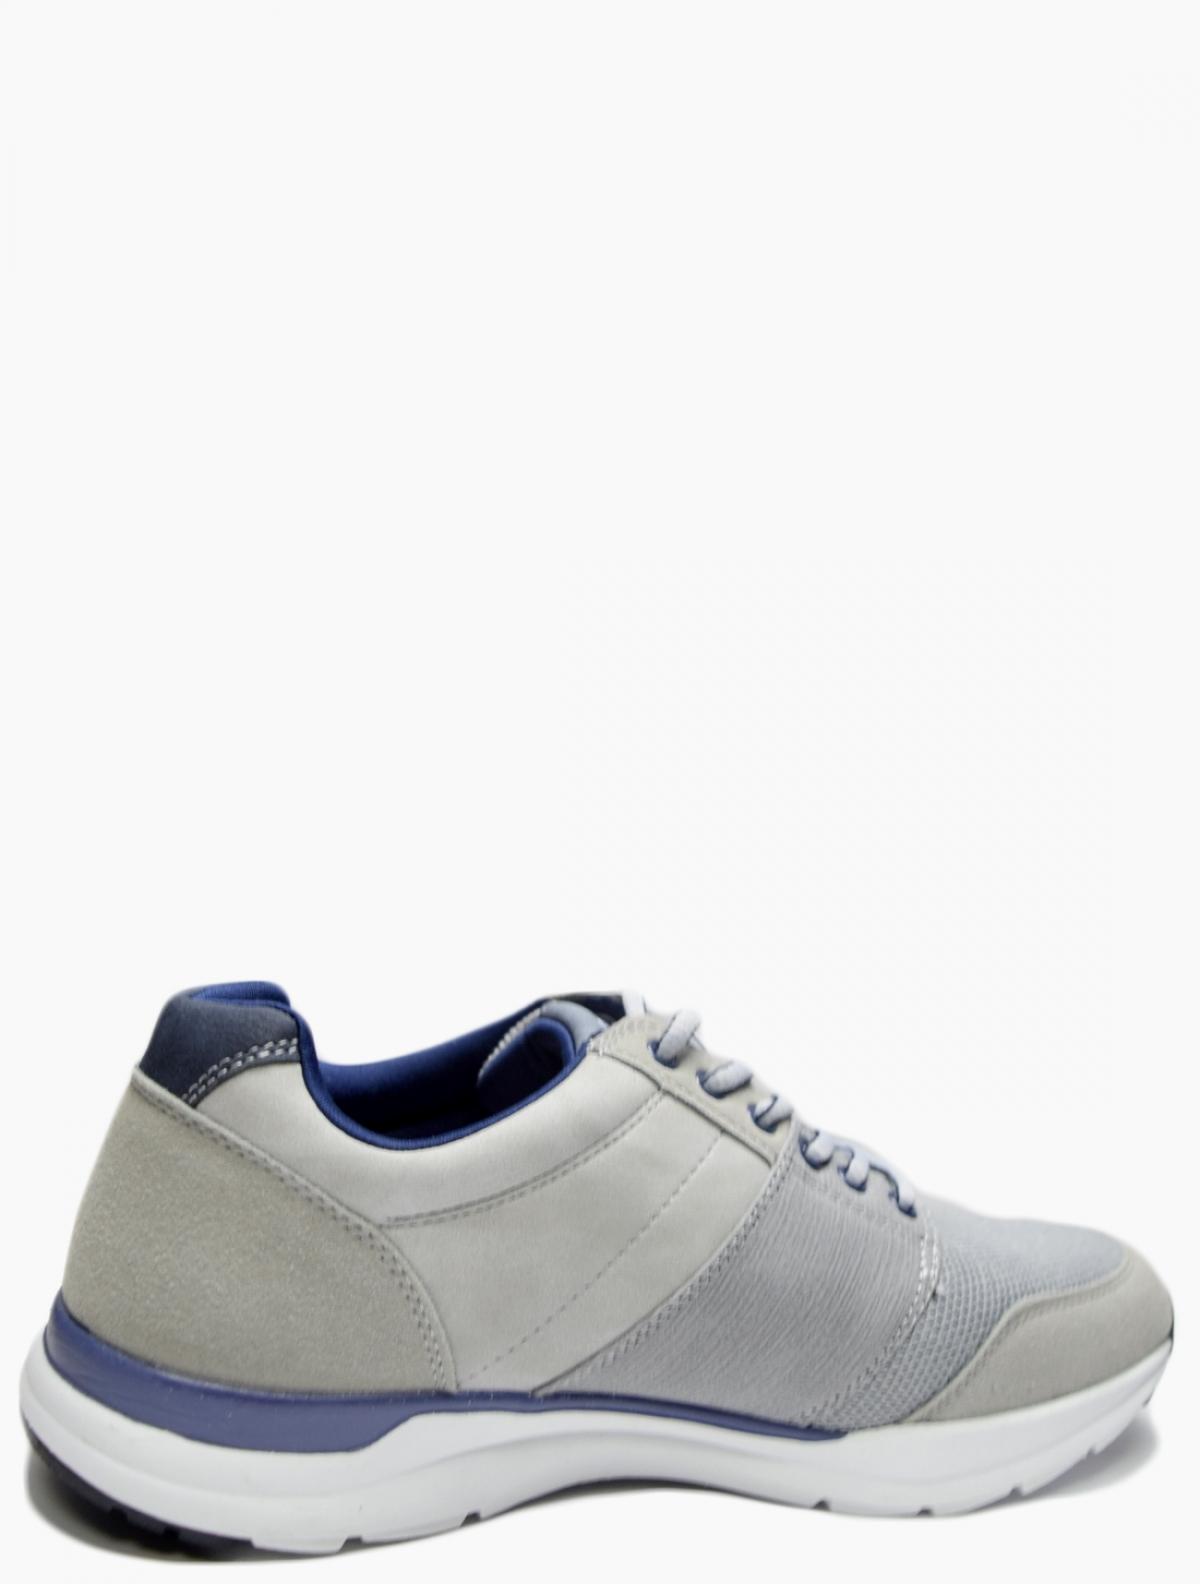 Respect IK63-118777 мужские кроссовки